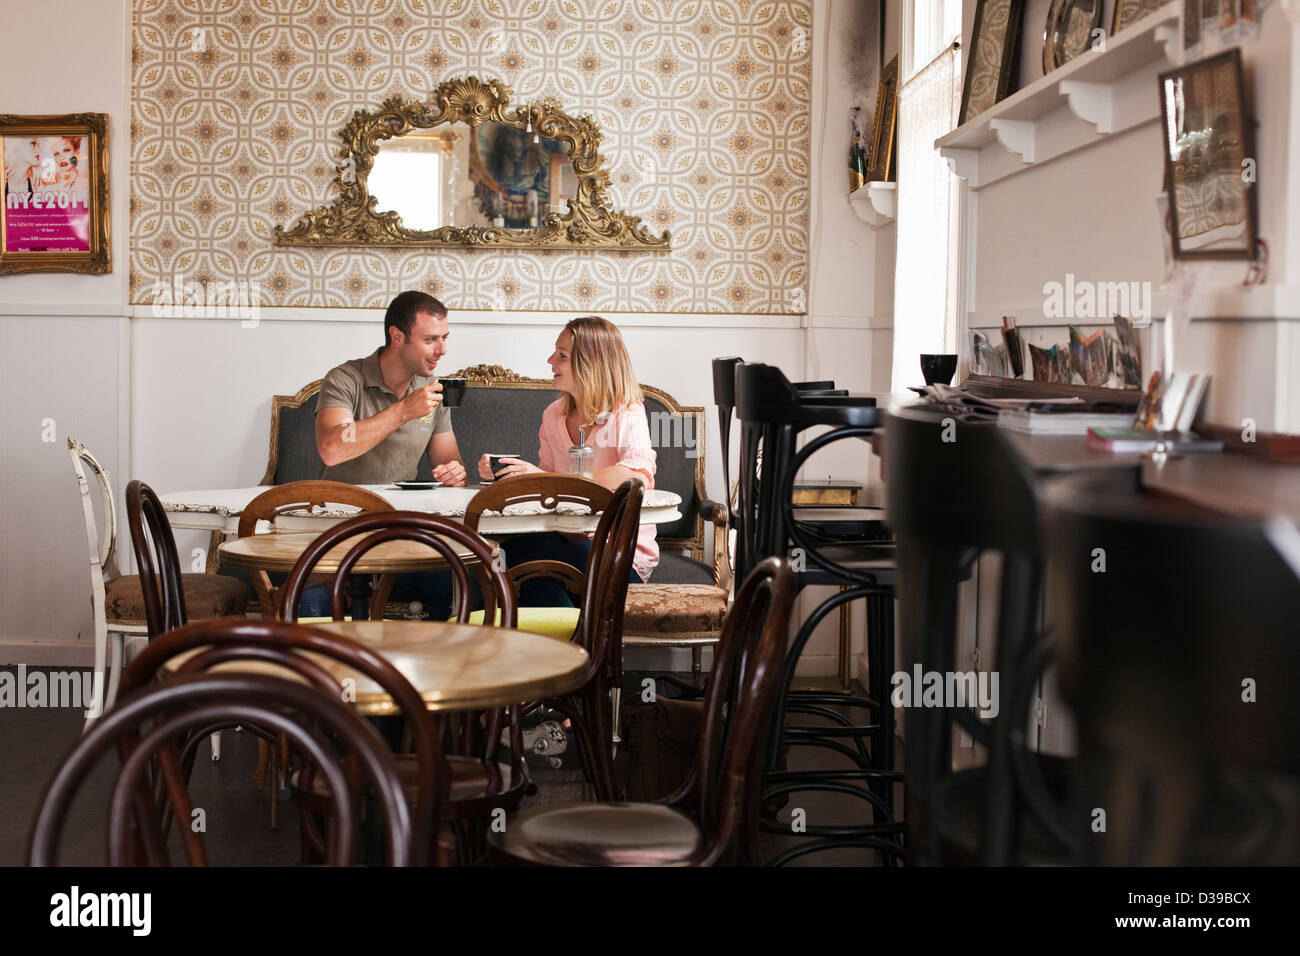 "Paare, Kaffee am ""Liberte am London"" Kaffeehaus und Weinbar. Albany, Western Australia, Australien Stockbild"